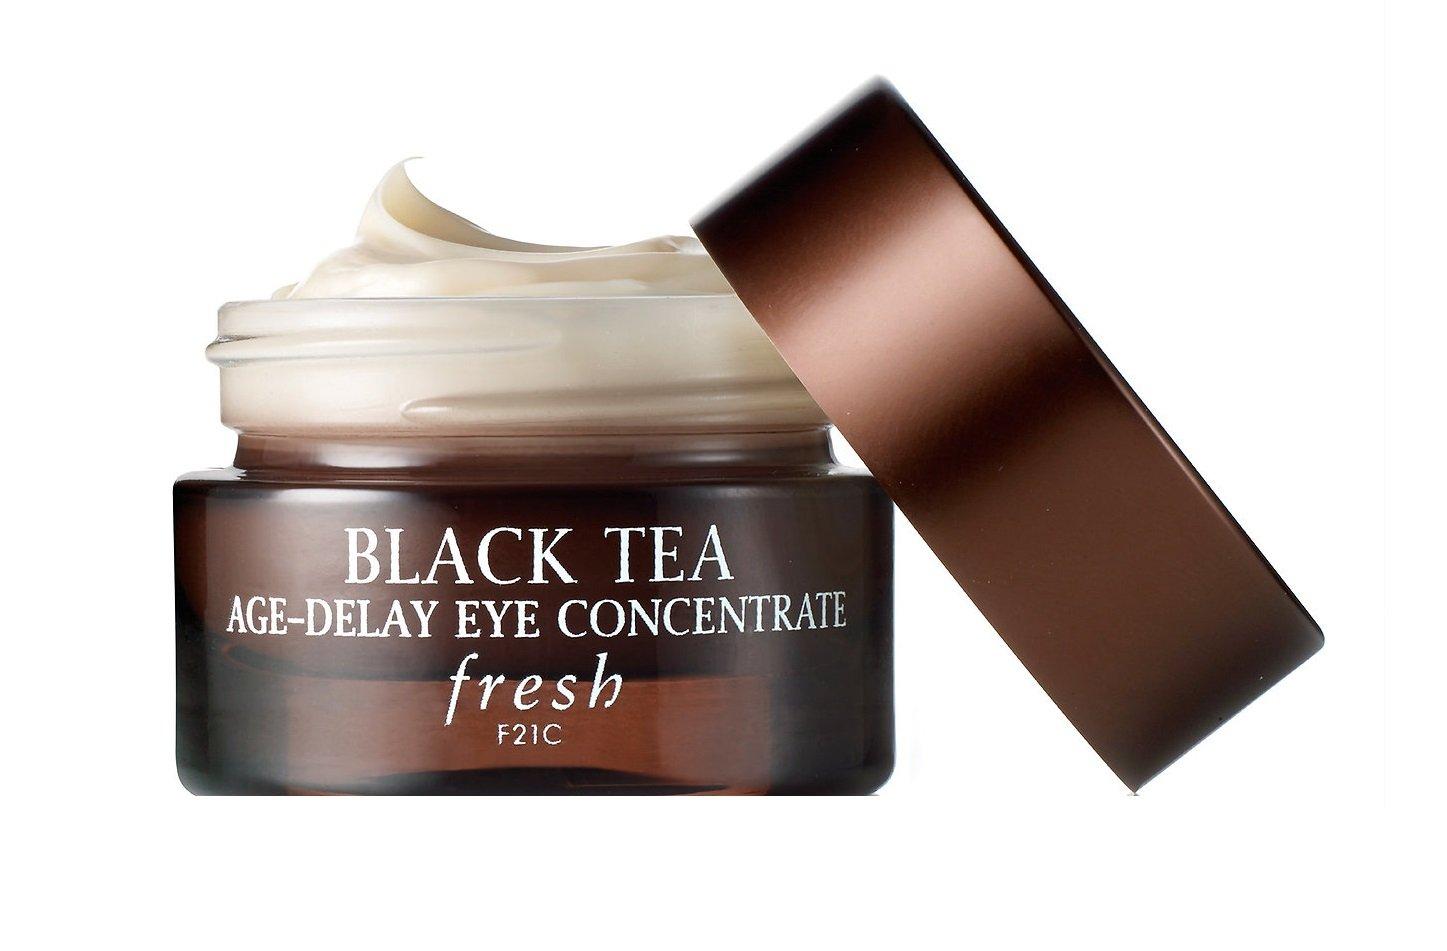 Fresh Black Tea Age Delay Eye Concentrate Mini 0.1 oz